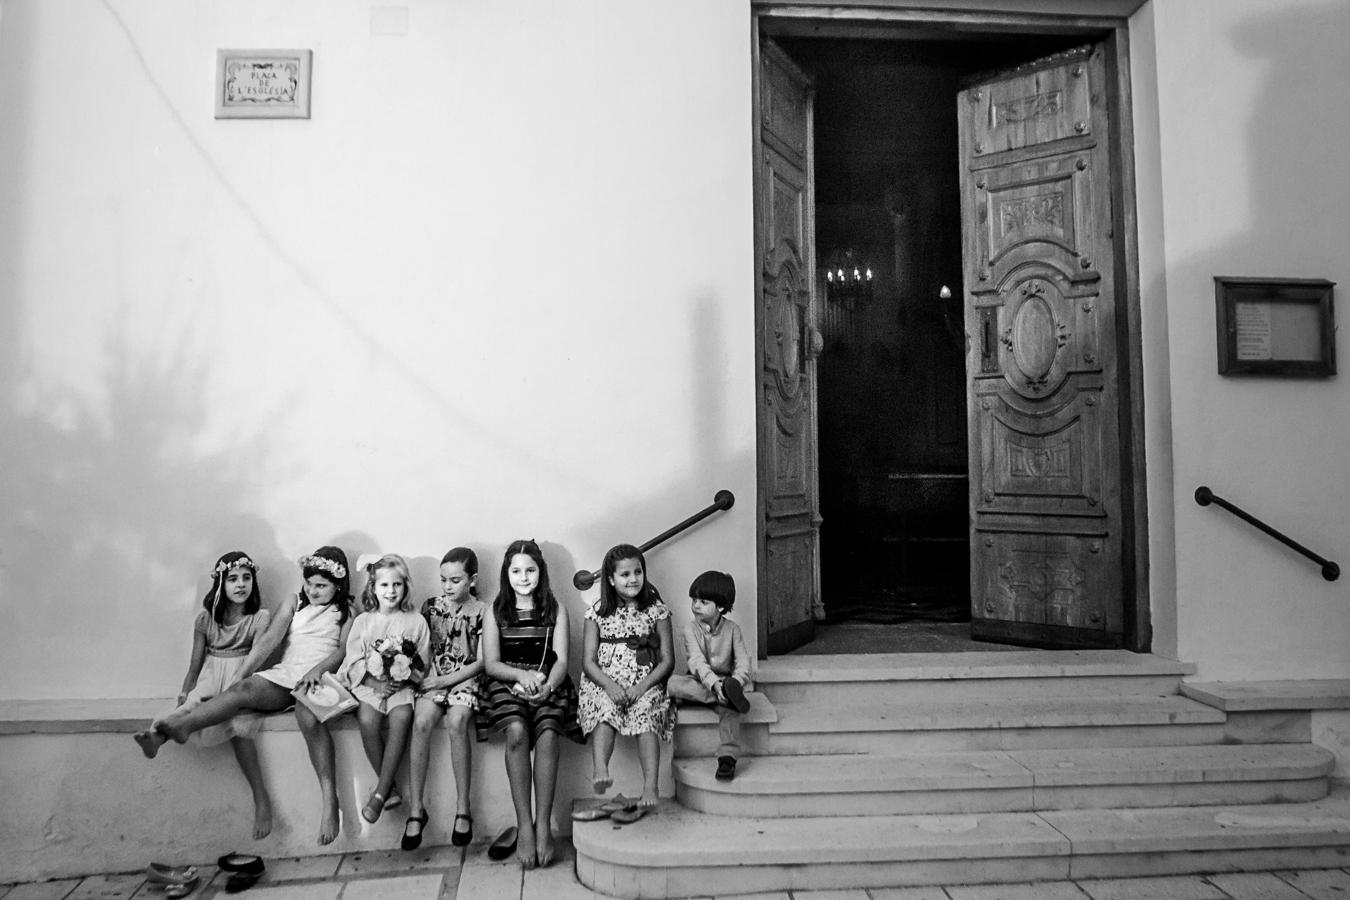 Aniversario-de-Bodas-5-Photographer-Nelly-del-Arbo.jpg